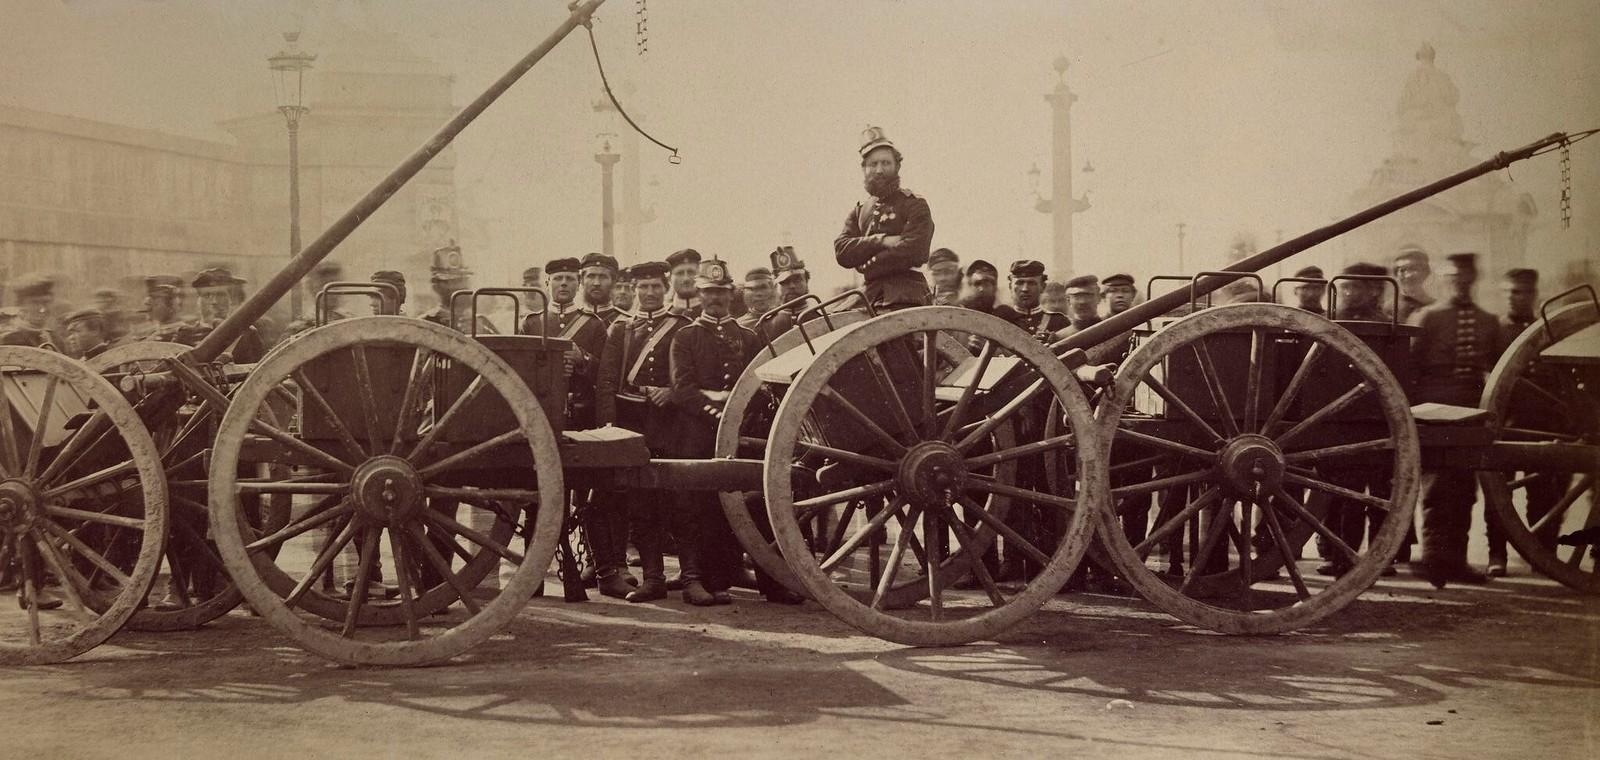 14. 1871. Прусская артиллерия на площади Согласия в Париже, 1 марта